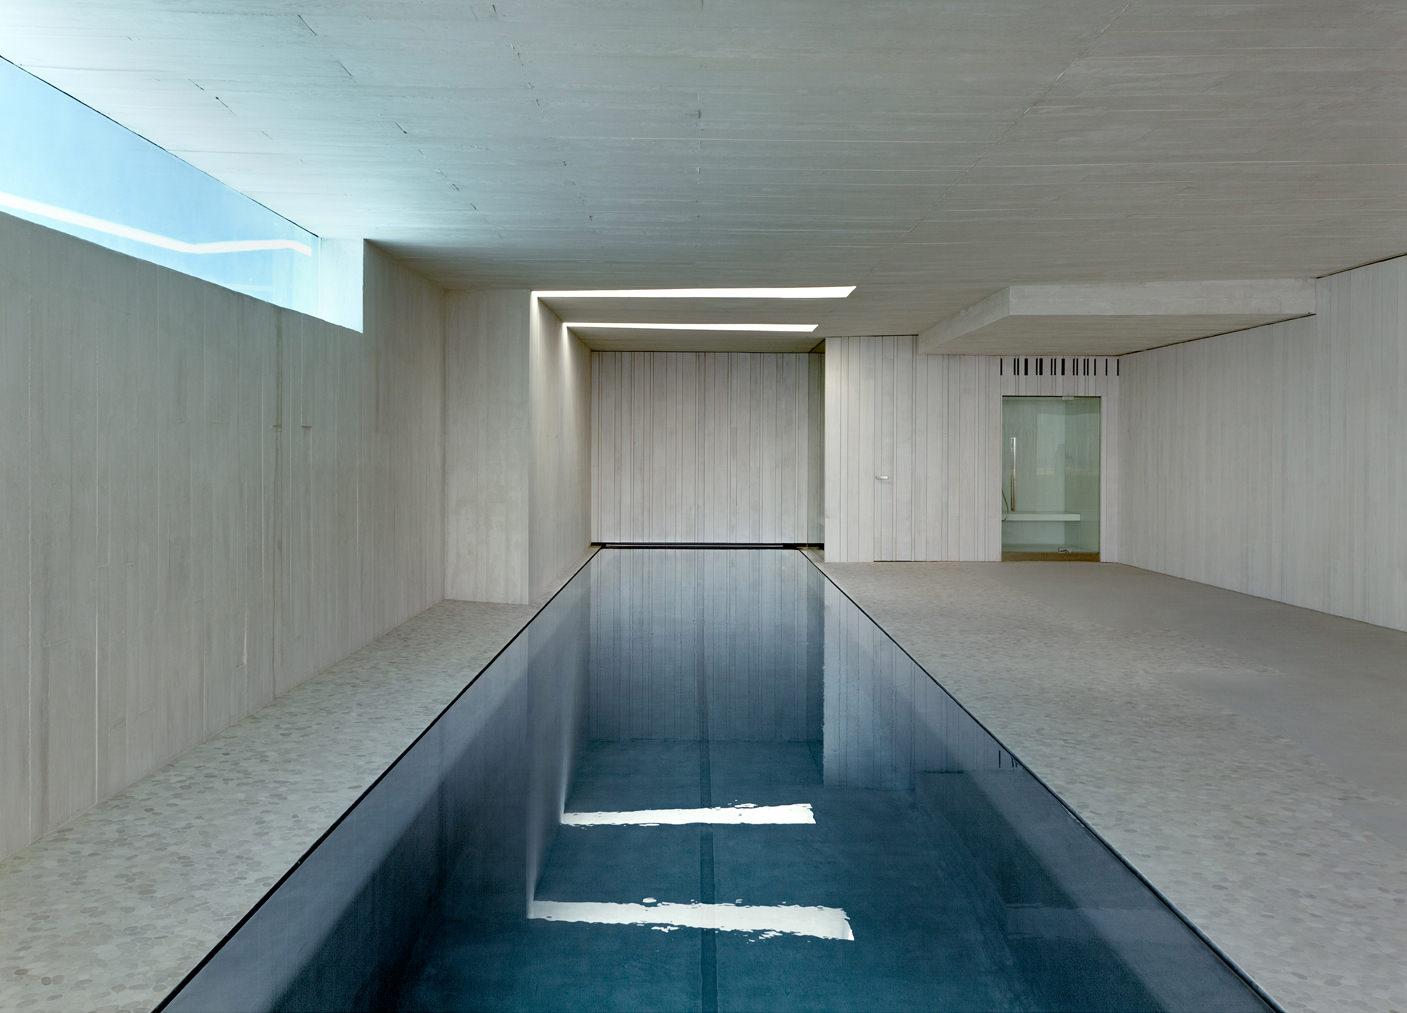 casa-sardinera-javea-alicante-ramon-esteve-design-architecture-effronte-03